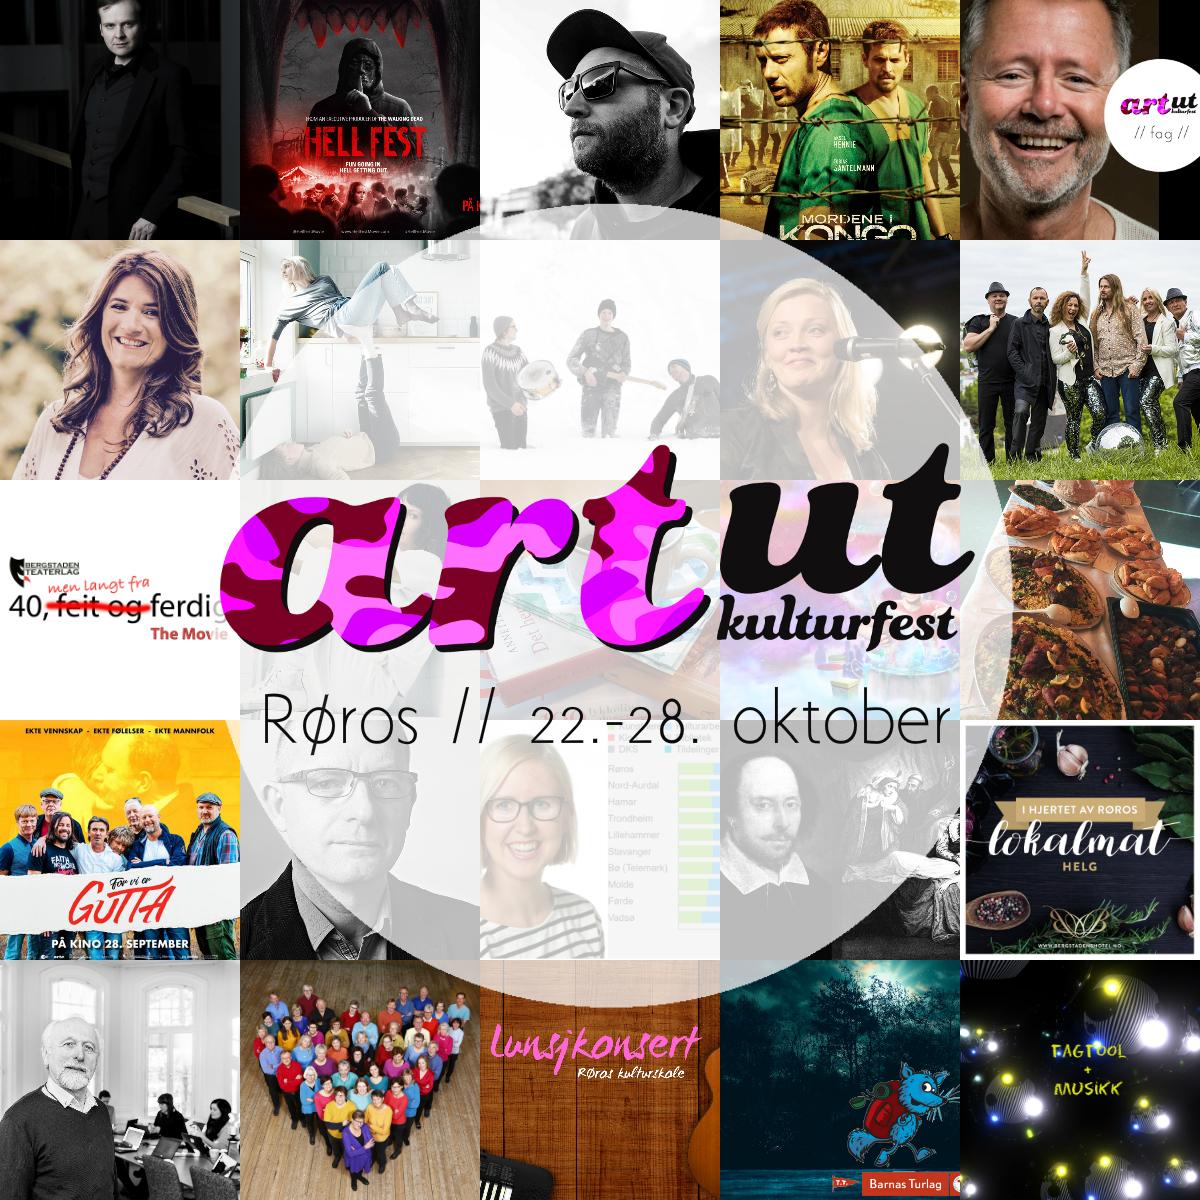 Artut kulturfestival